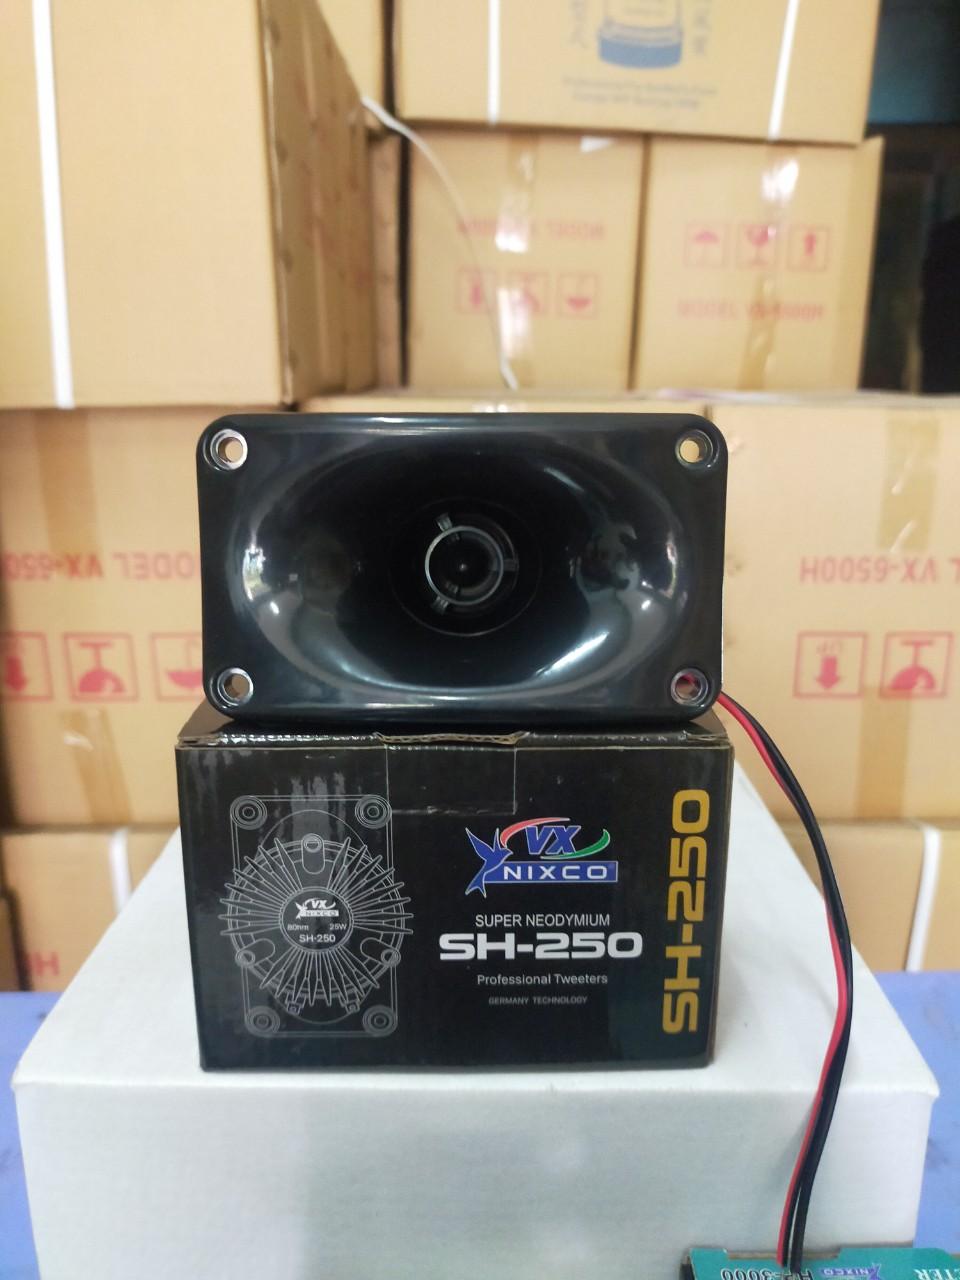 Loa Nixco SH250 - Loa cửa trong nhà yến